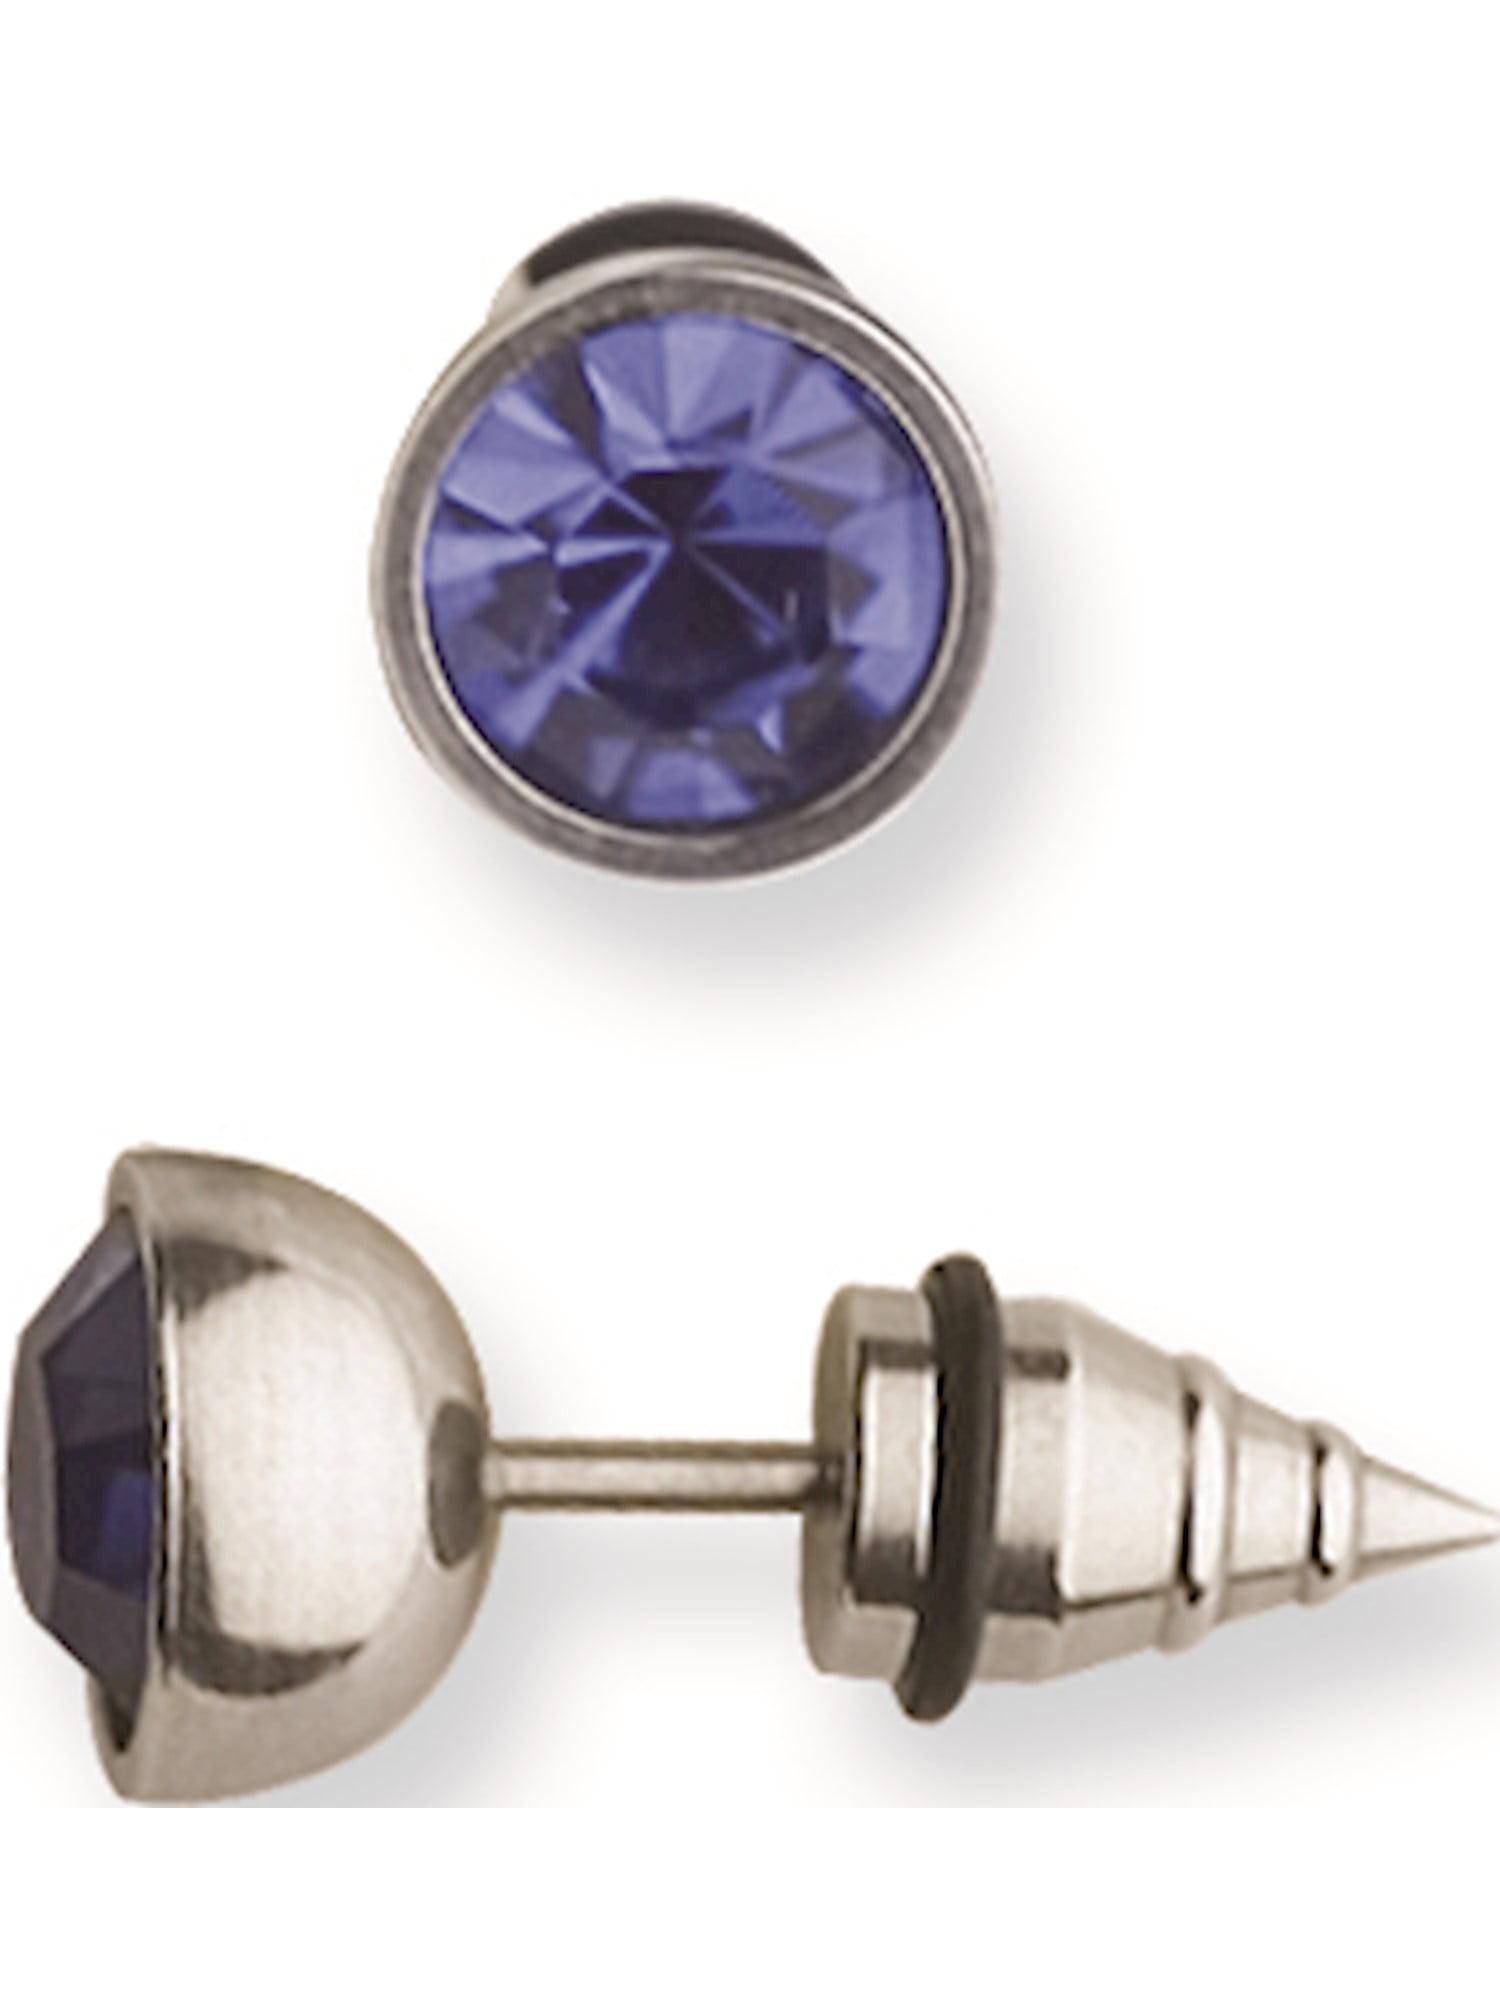 Jewelry by Sweet Pea 316L SRG GR SSTL 14G 13//32Platd Cobalt Ball//Cross Belly Ring